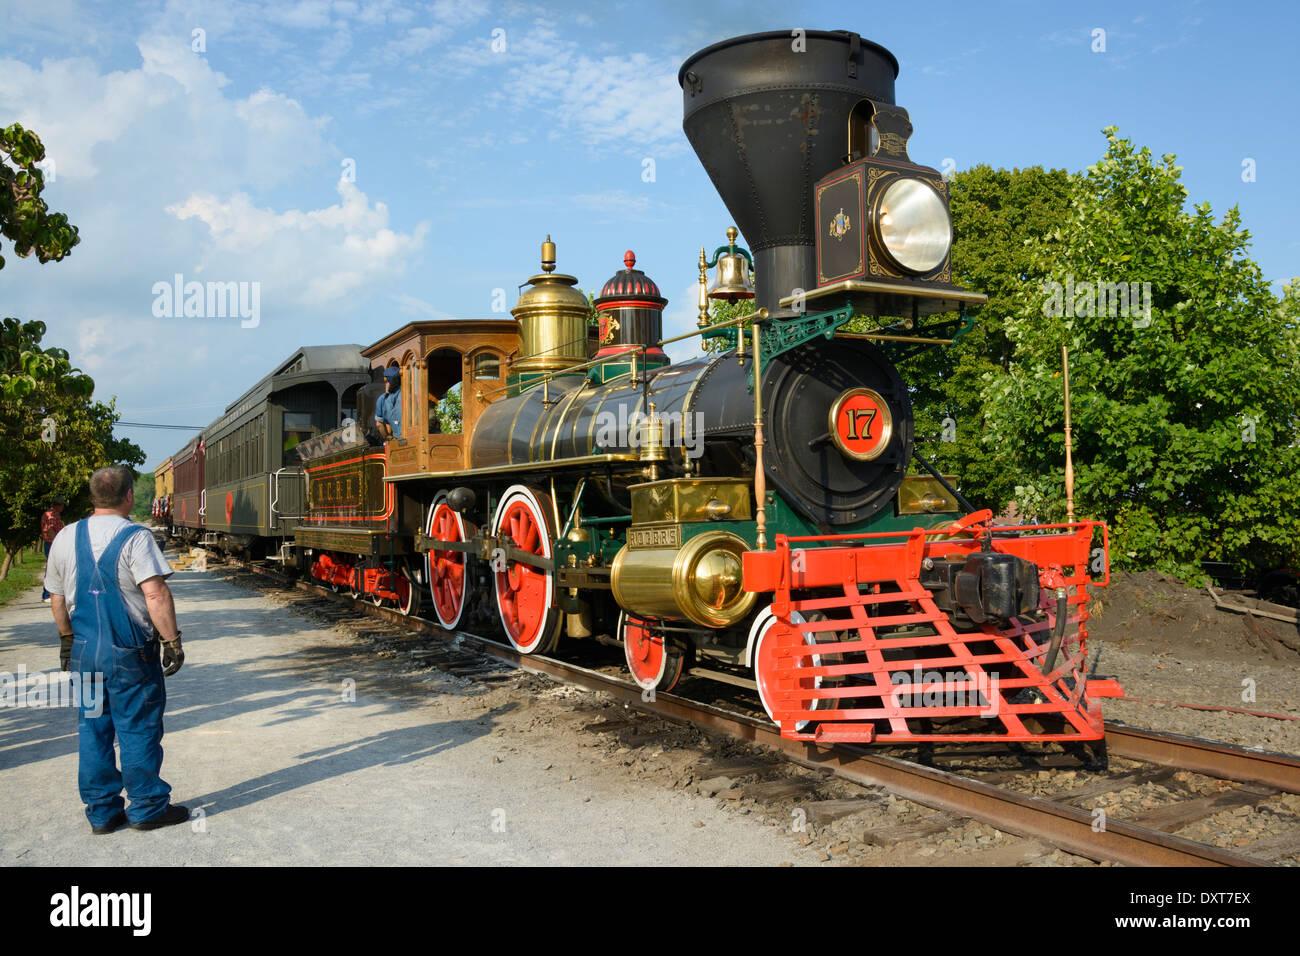 Antique Train Headlight : Vintage steam engine locomotive replica stock photo